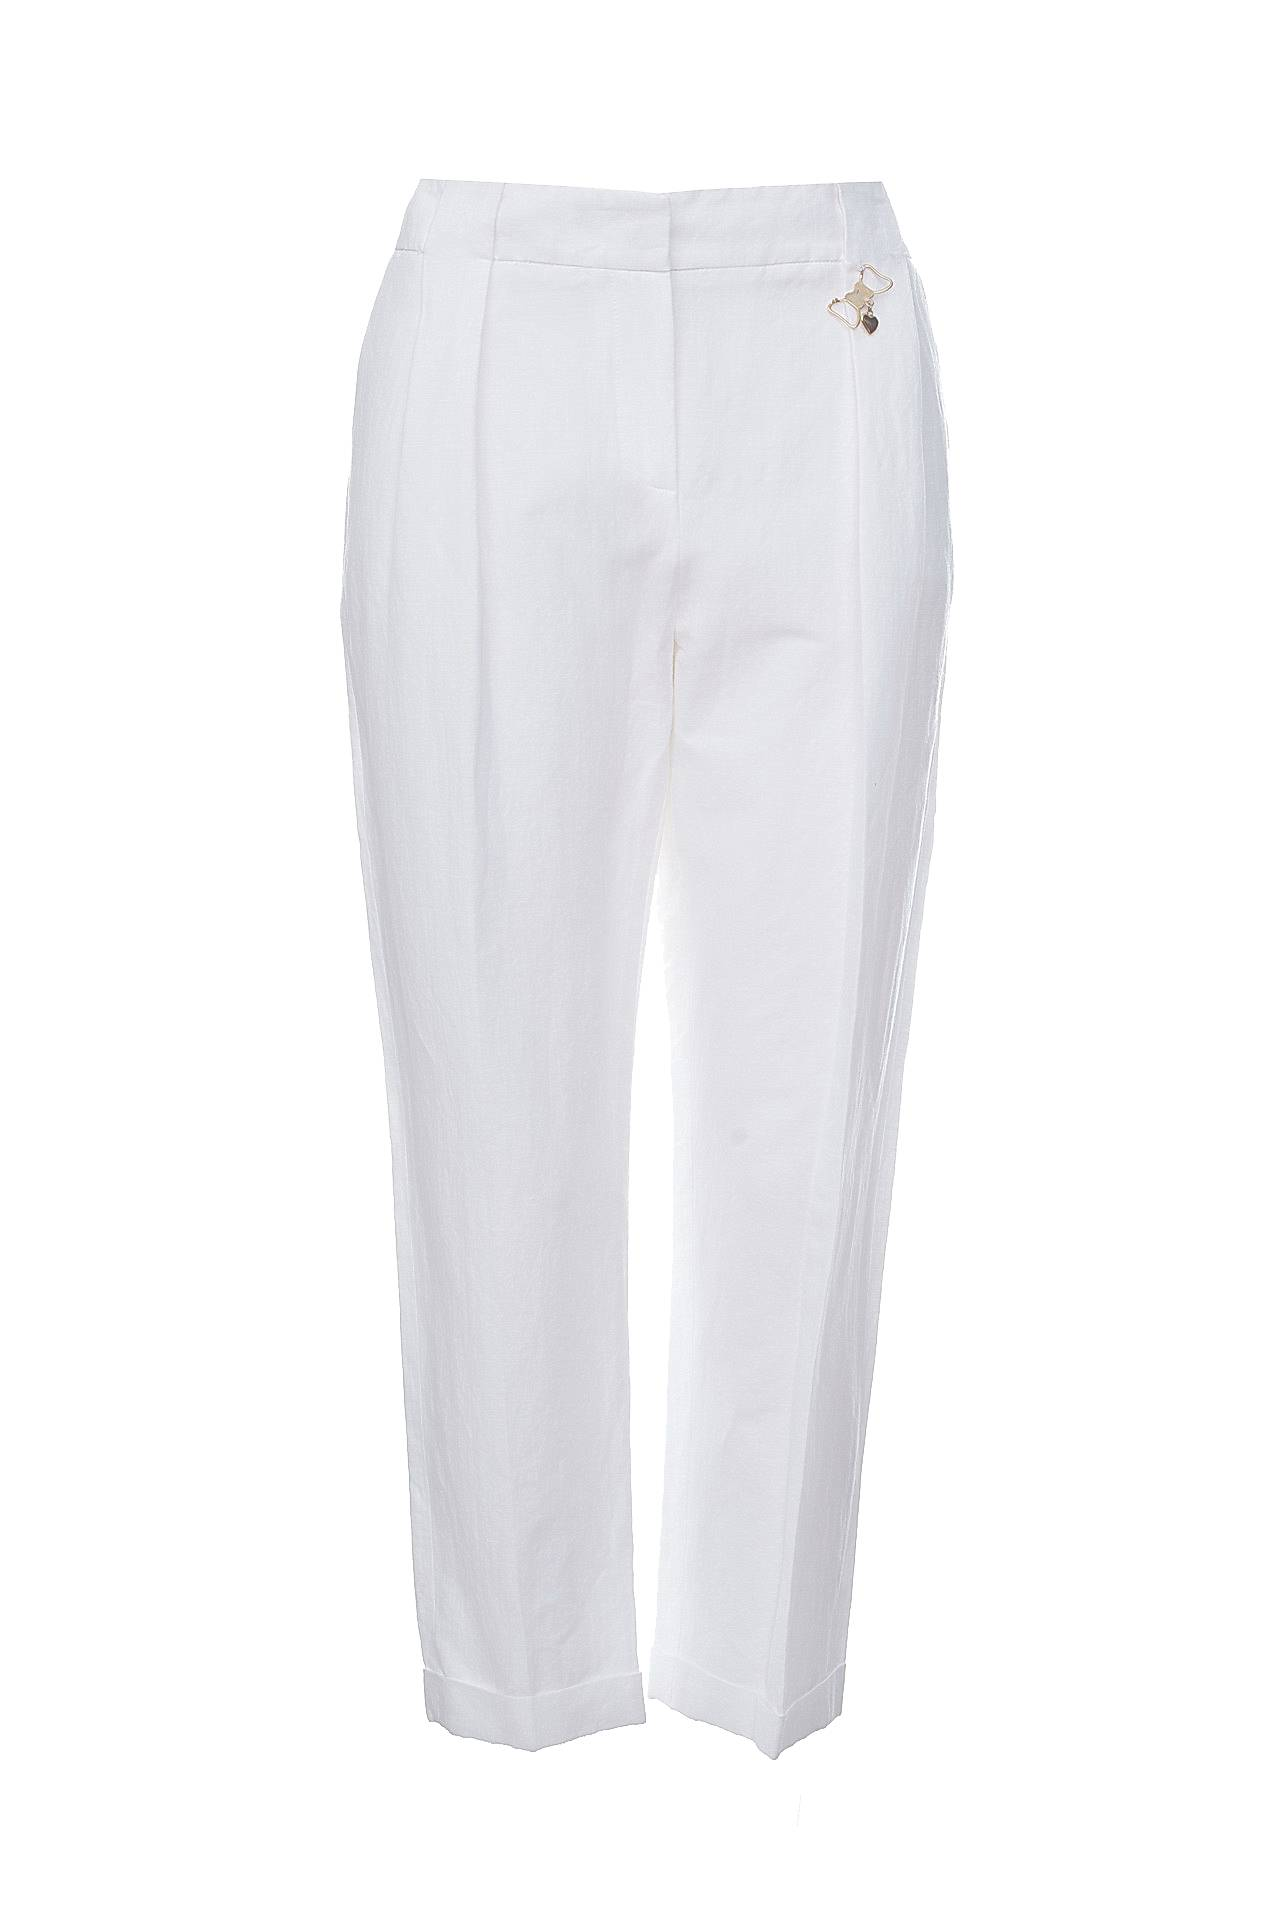 вине женские белые брюки картинки кинотеатре девушка мало